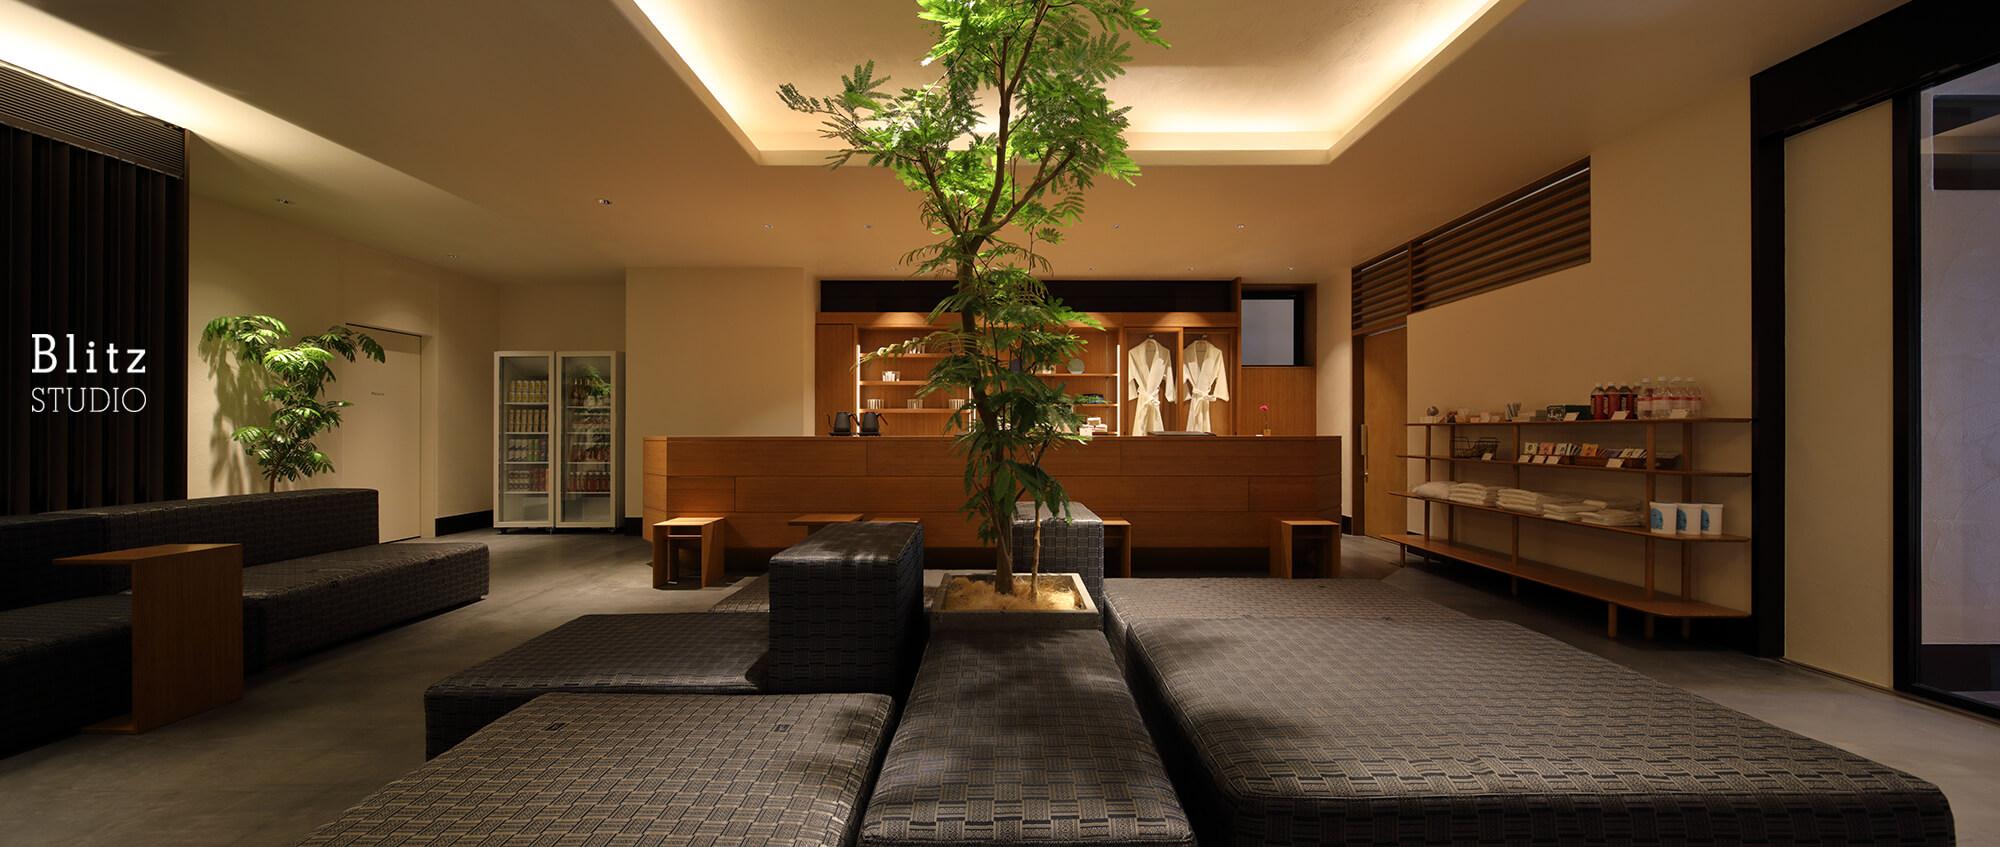 『HOTEL GREAT MORNING』建築写真・竣工写真・インテリア写真7